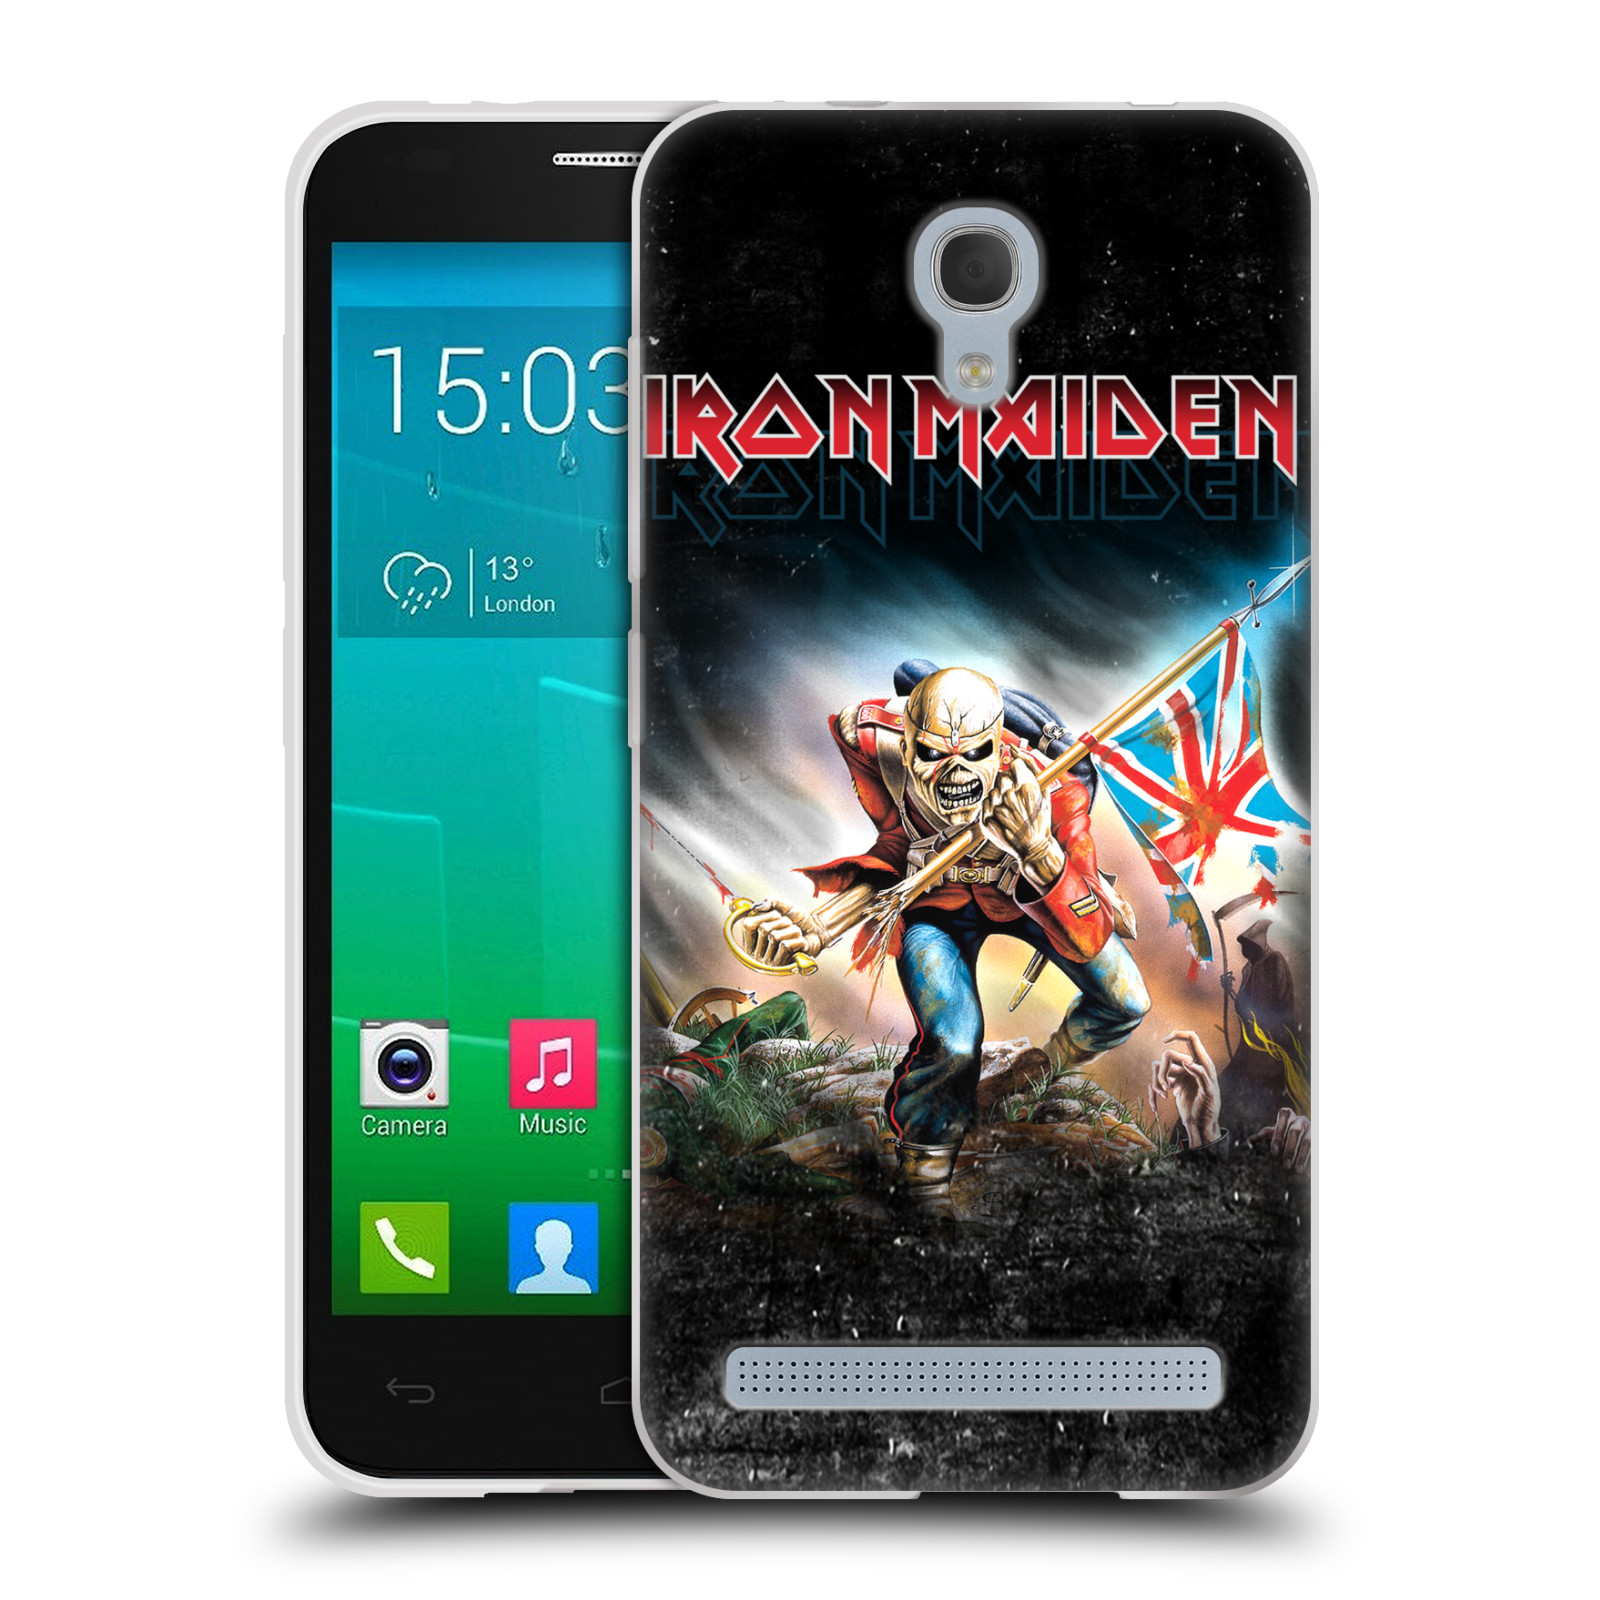 Silikonové pouzdro na mobil Alcatel One Touch Idol 2 Mini S 6036Y HEAD CASE - Iron Maiden - Trooper 2016 (Silikonový kryt či obal na mobilní telefon s licencovaným motivem Iron Maiden Alcatel Idol 2 Mini S OT-6036Y)